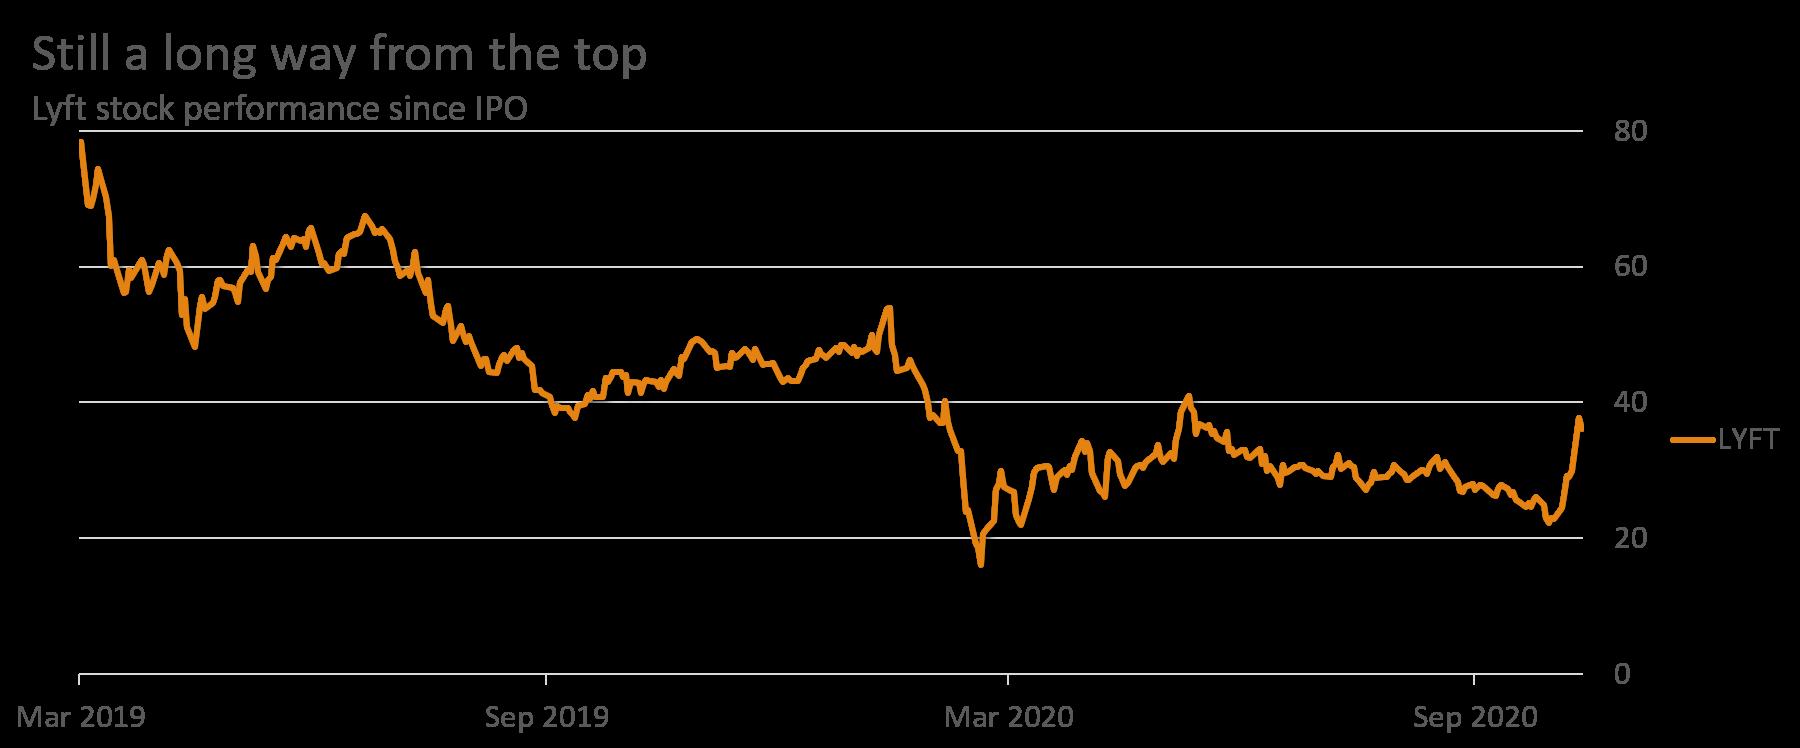 LYFT Stock - Price since IPO